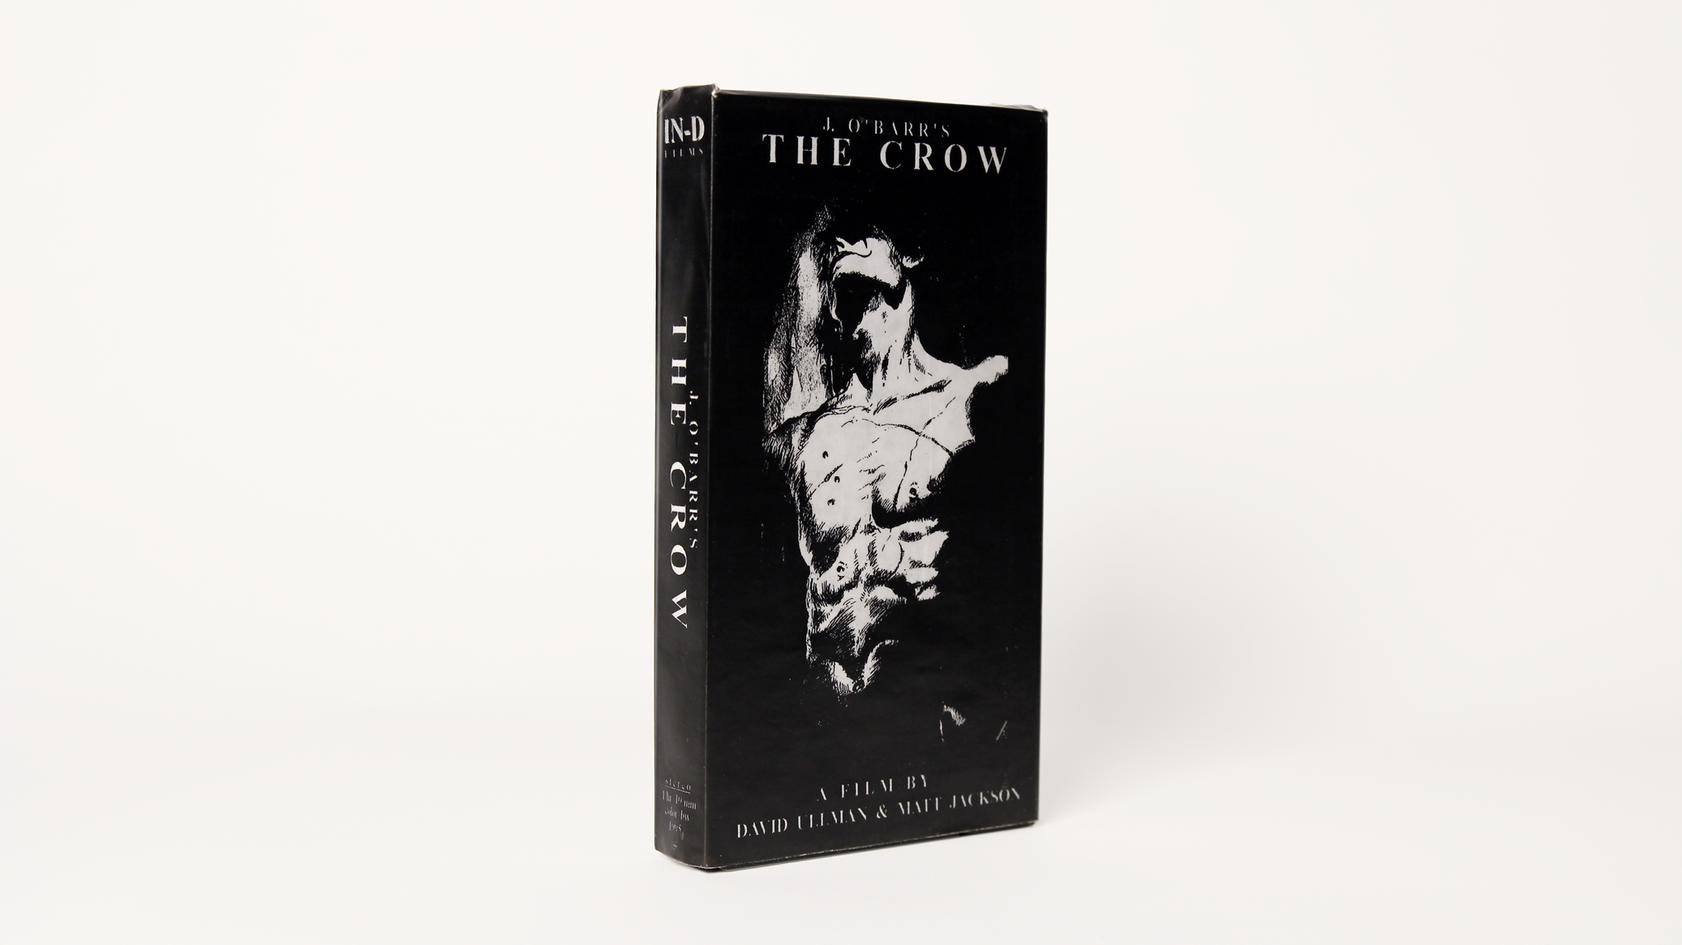 J. O'Barr's The Crow VHS (1995)